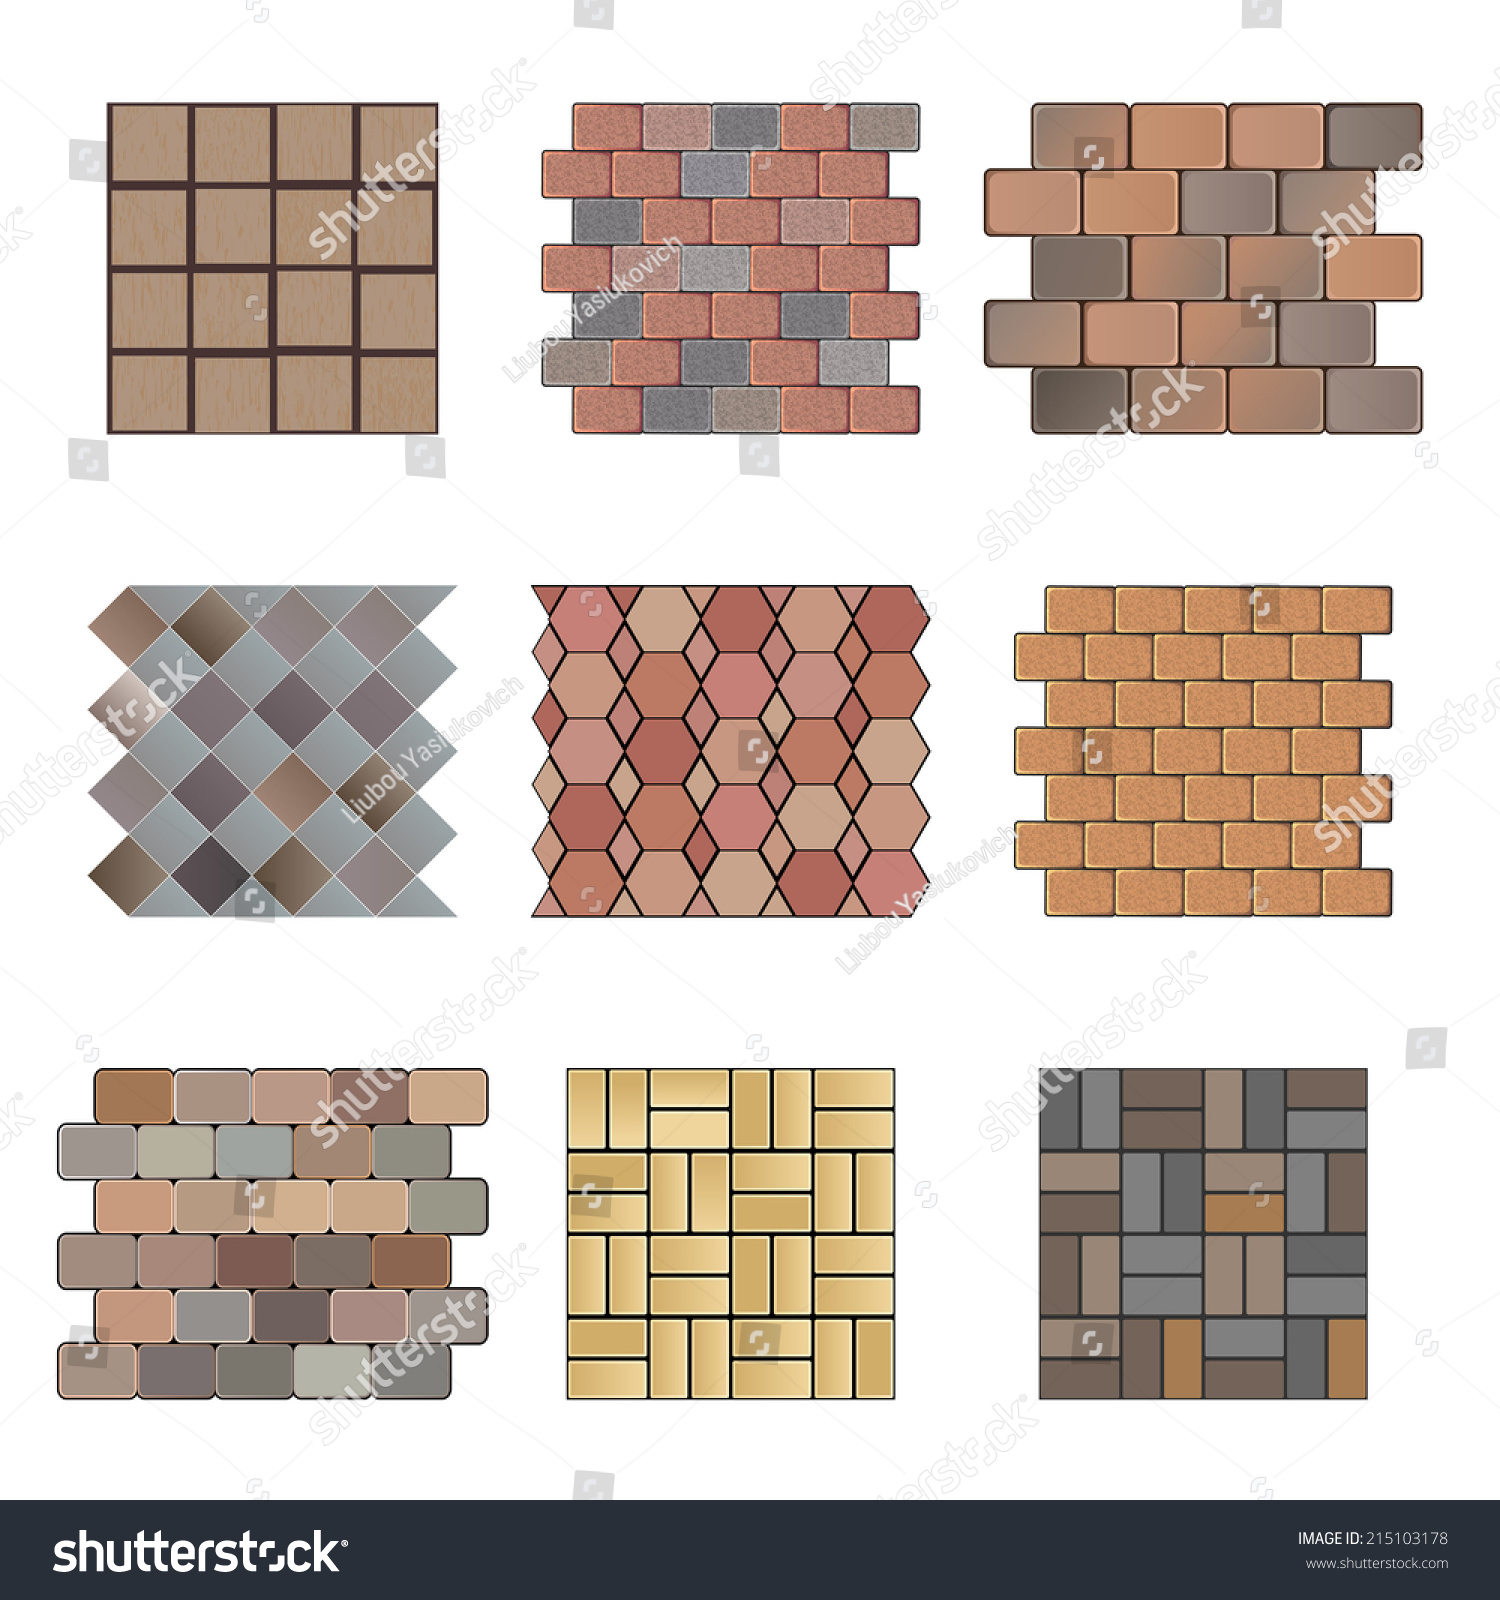 Detailed Landscape Design Elements Make Your Stock Vector 215103178 Shutterstock